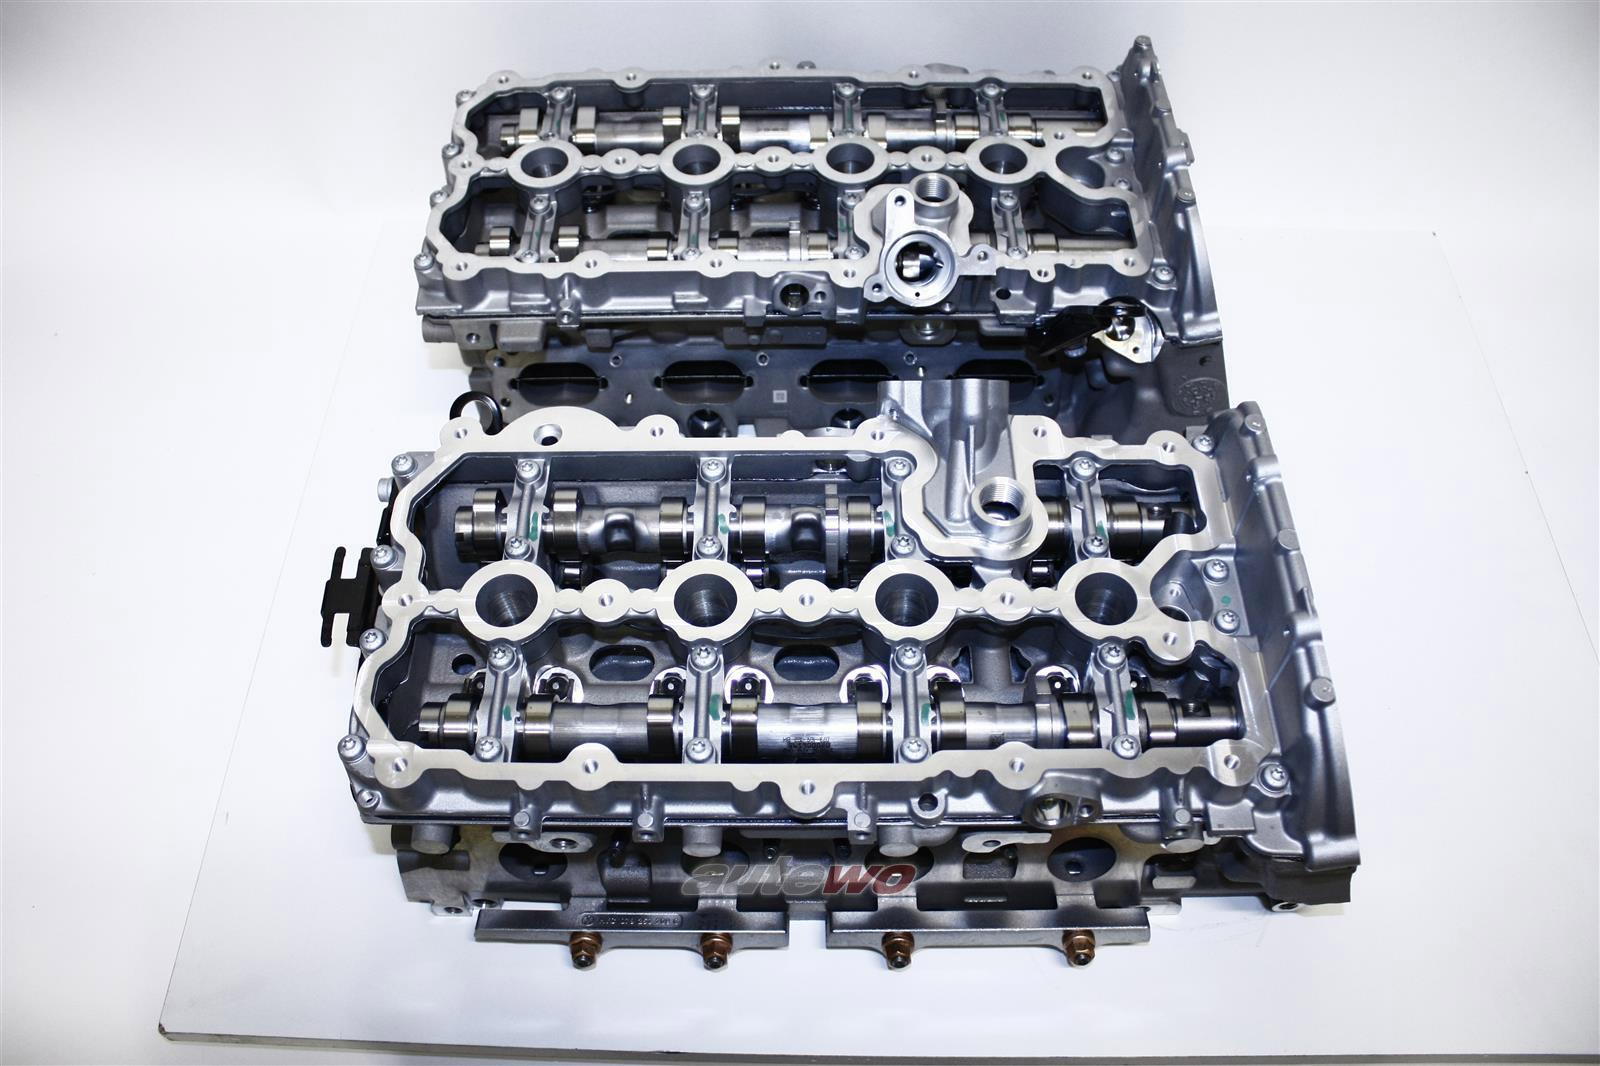 079103063/064BN/CA/CE/BG NEU Audi A6/S6/Allroad 4F/A8 D3 4.2l SET Zylinderköpfe